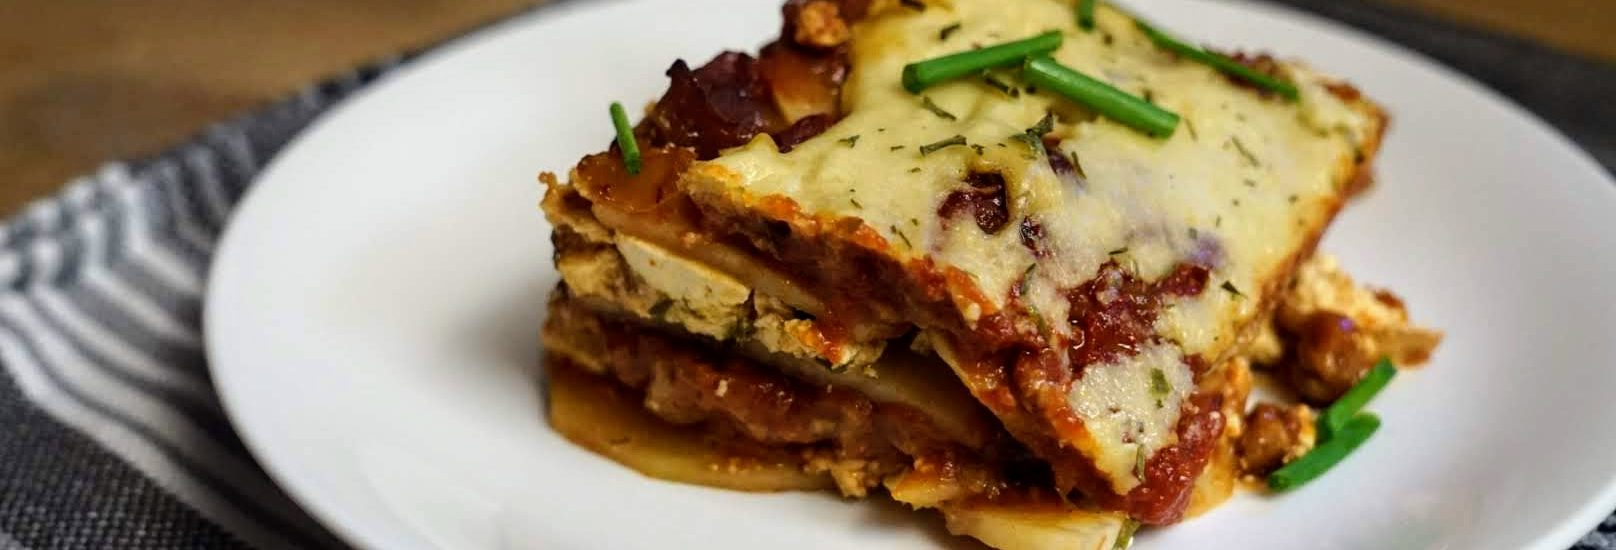 VeganMoFo – Potato Lasagna